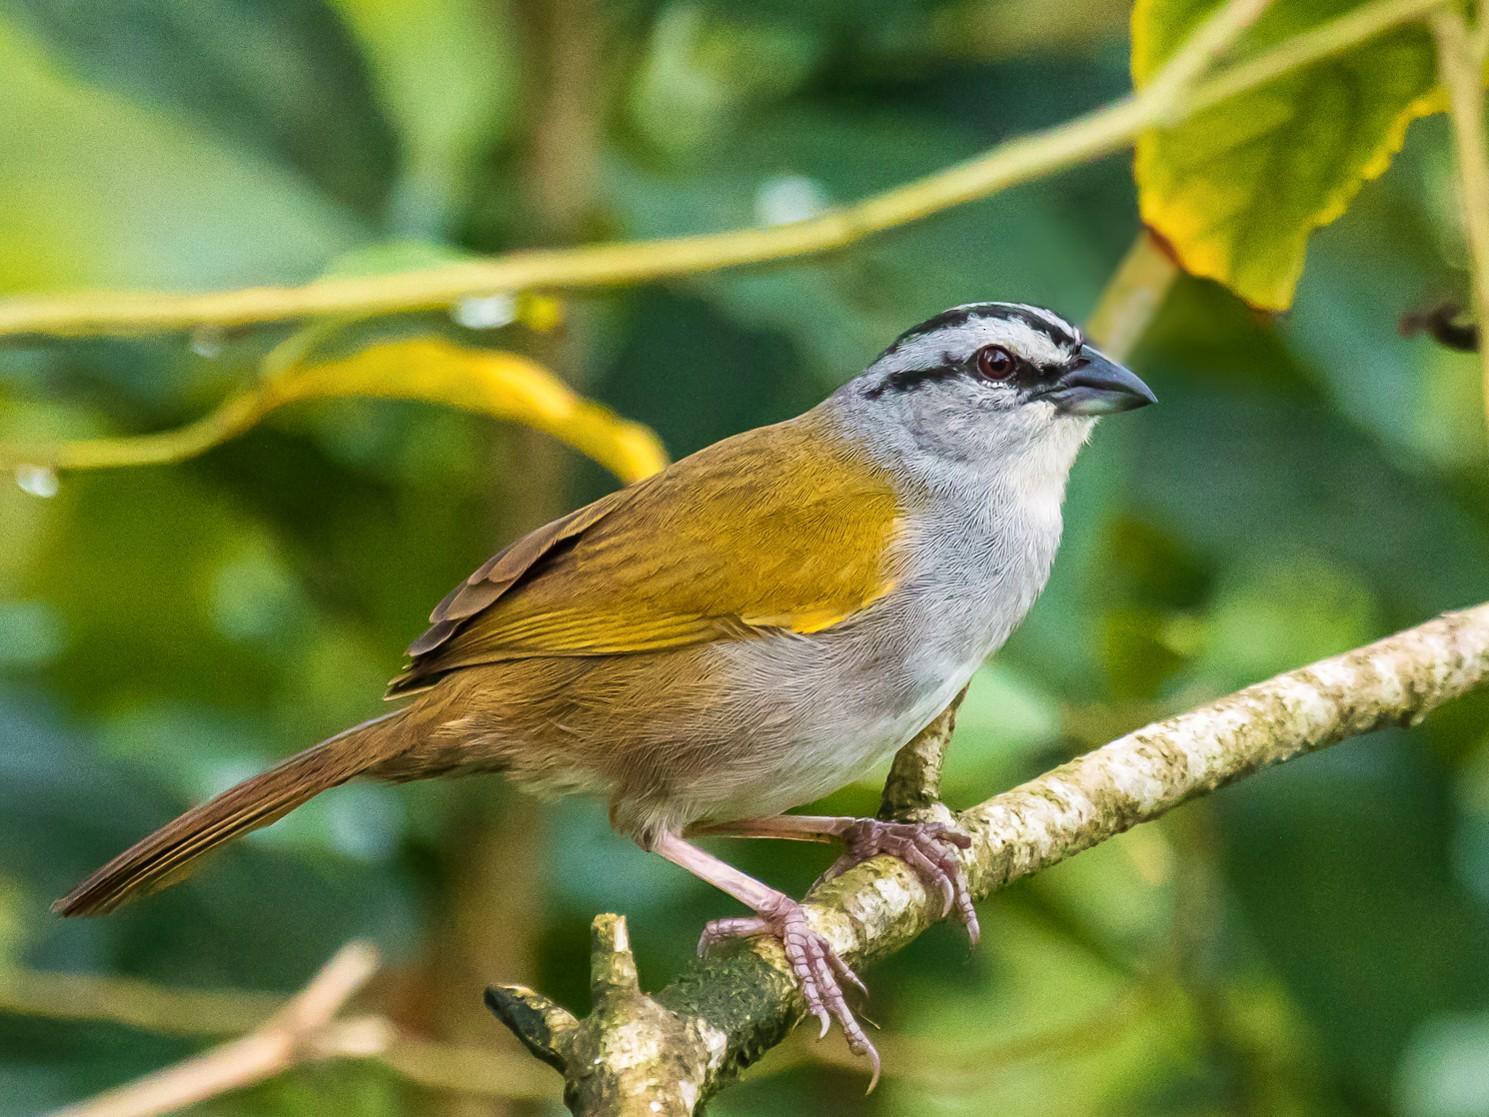 Black-striped Sparrow - graichen & recer